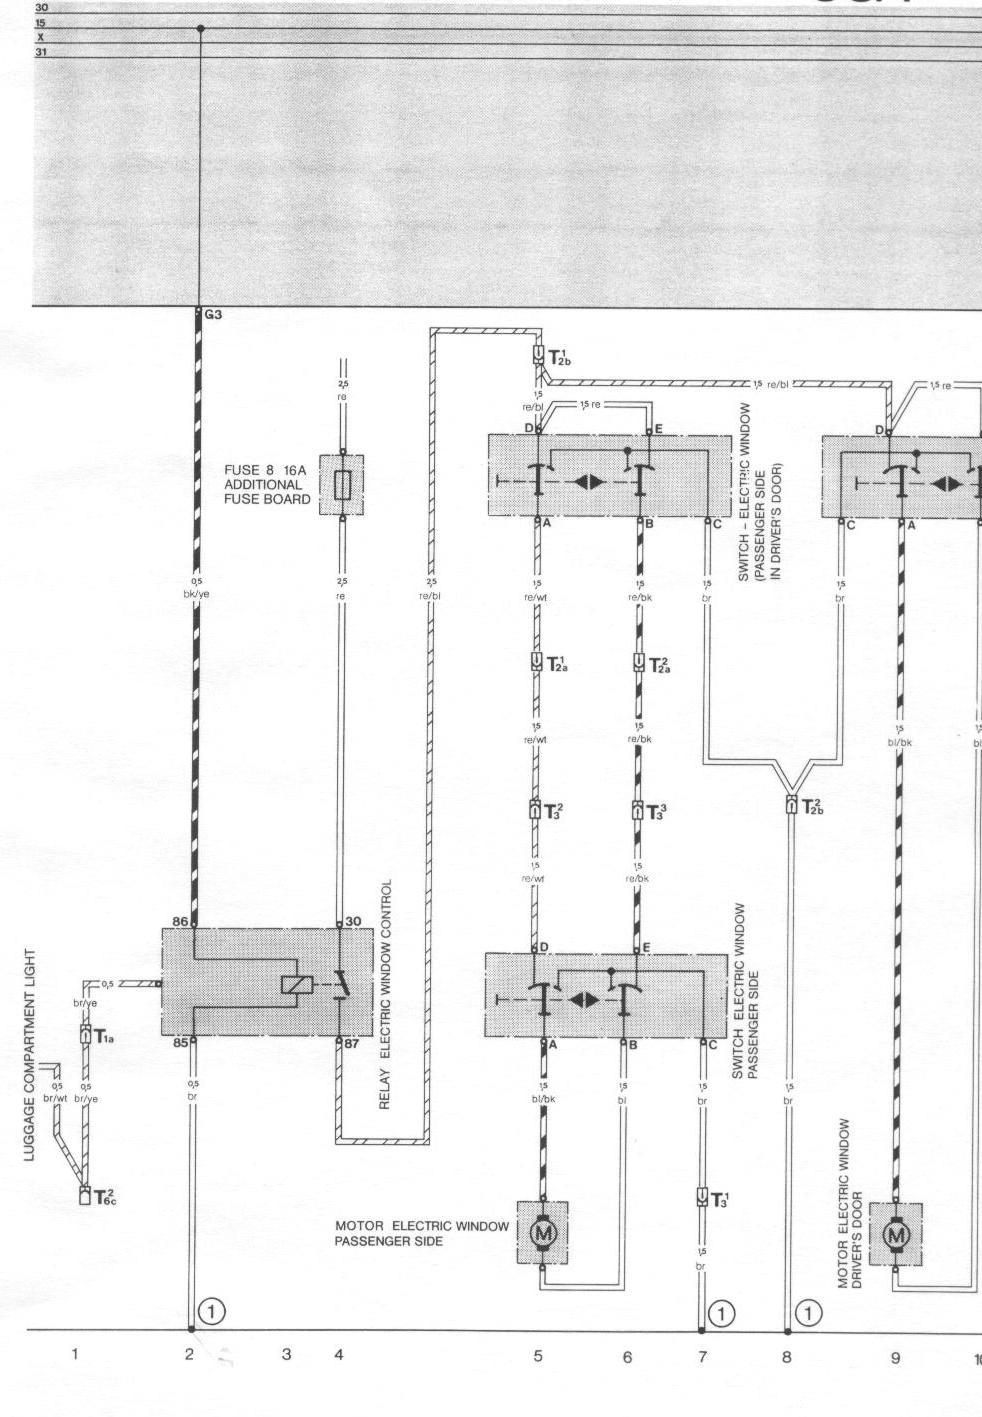 schematic and wiring diagram 2001 honda civic belt pelican parts: porsche 924/944 electrical diagrams